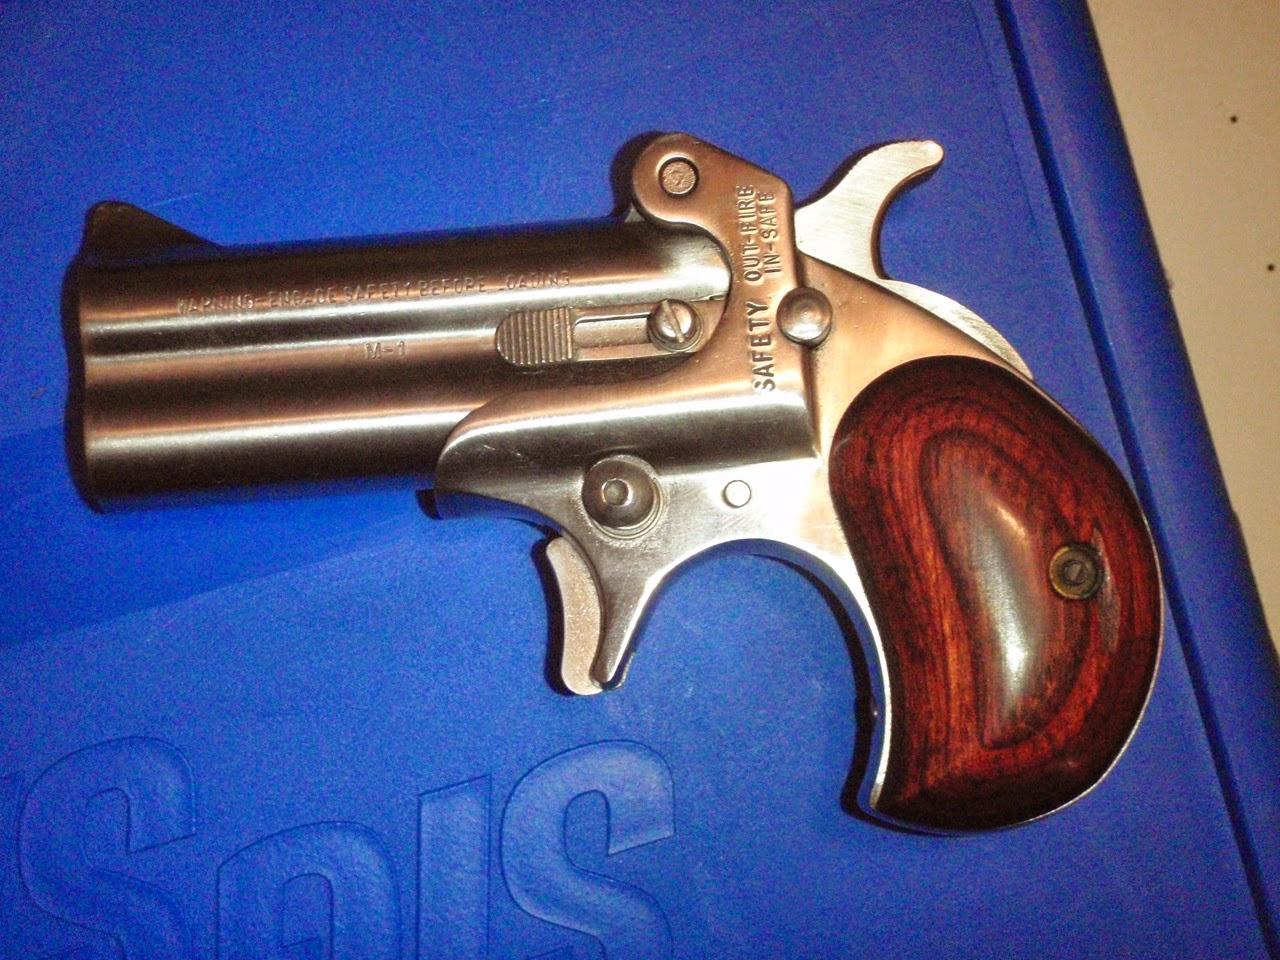 on target shooter nz: American Derringer Corp: 10MM Derringer.